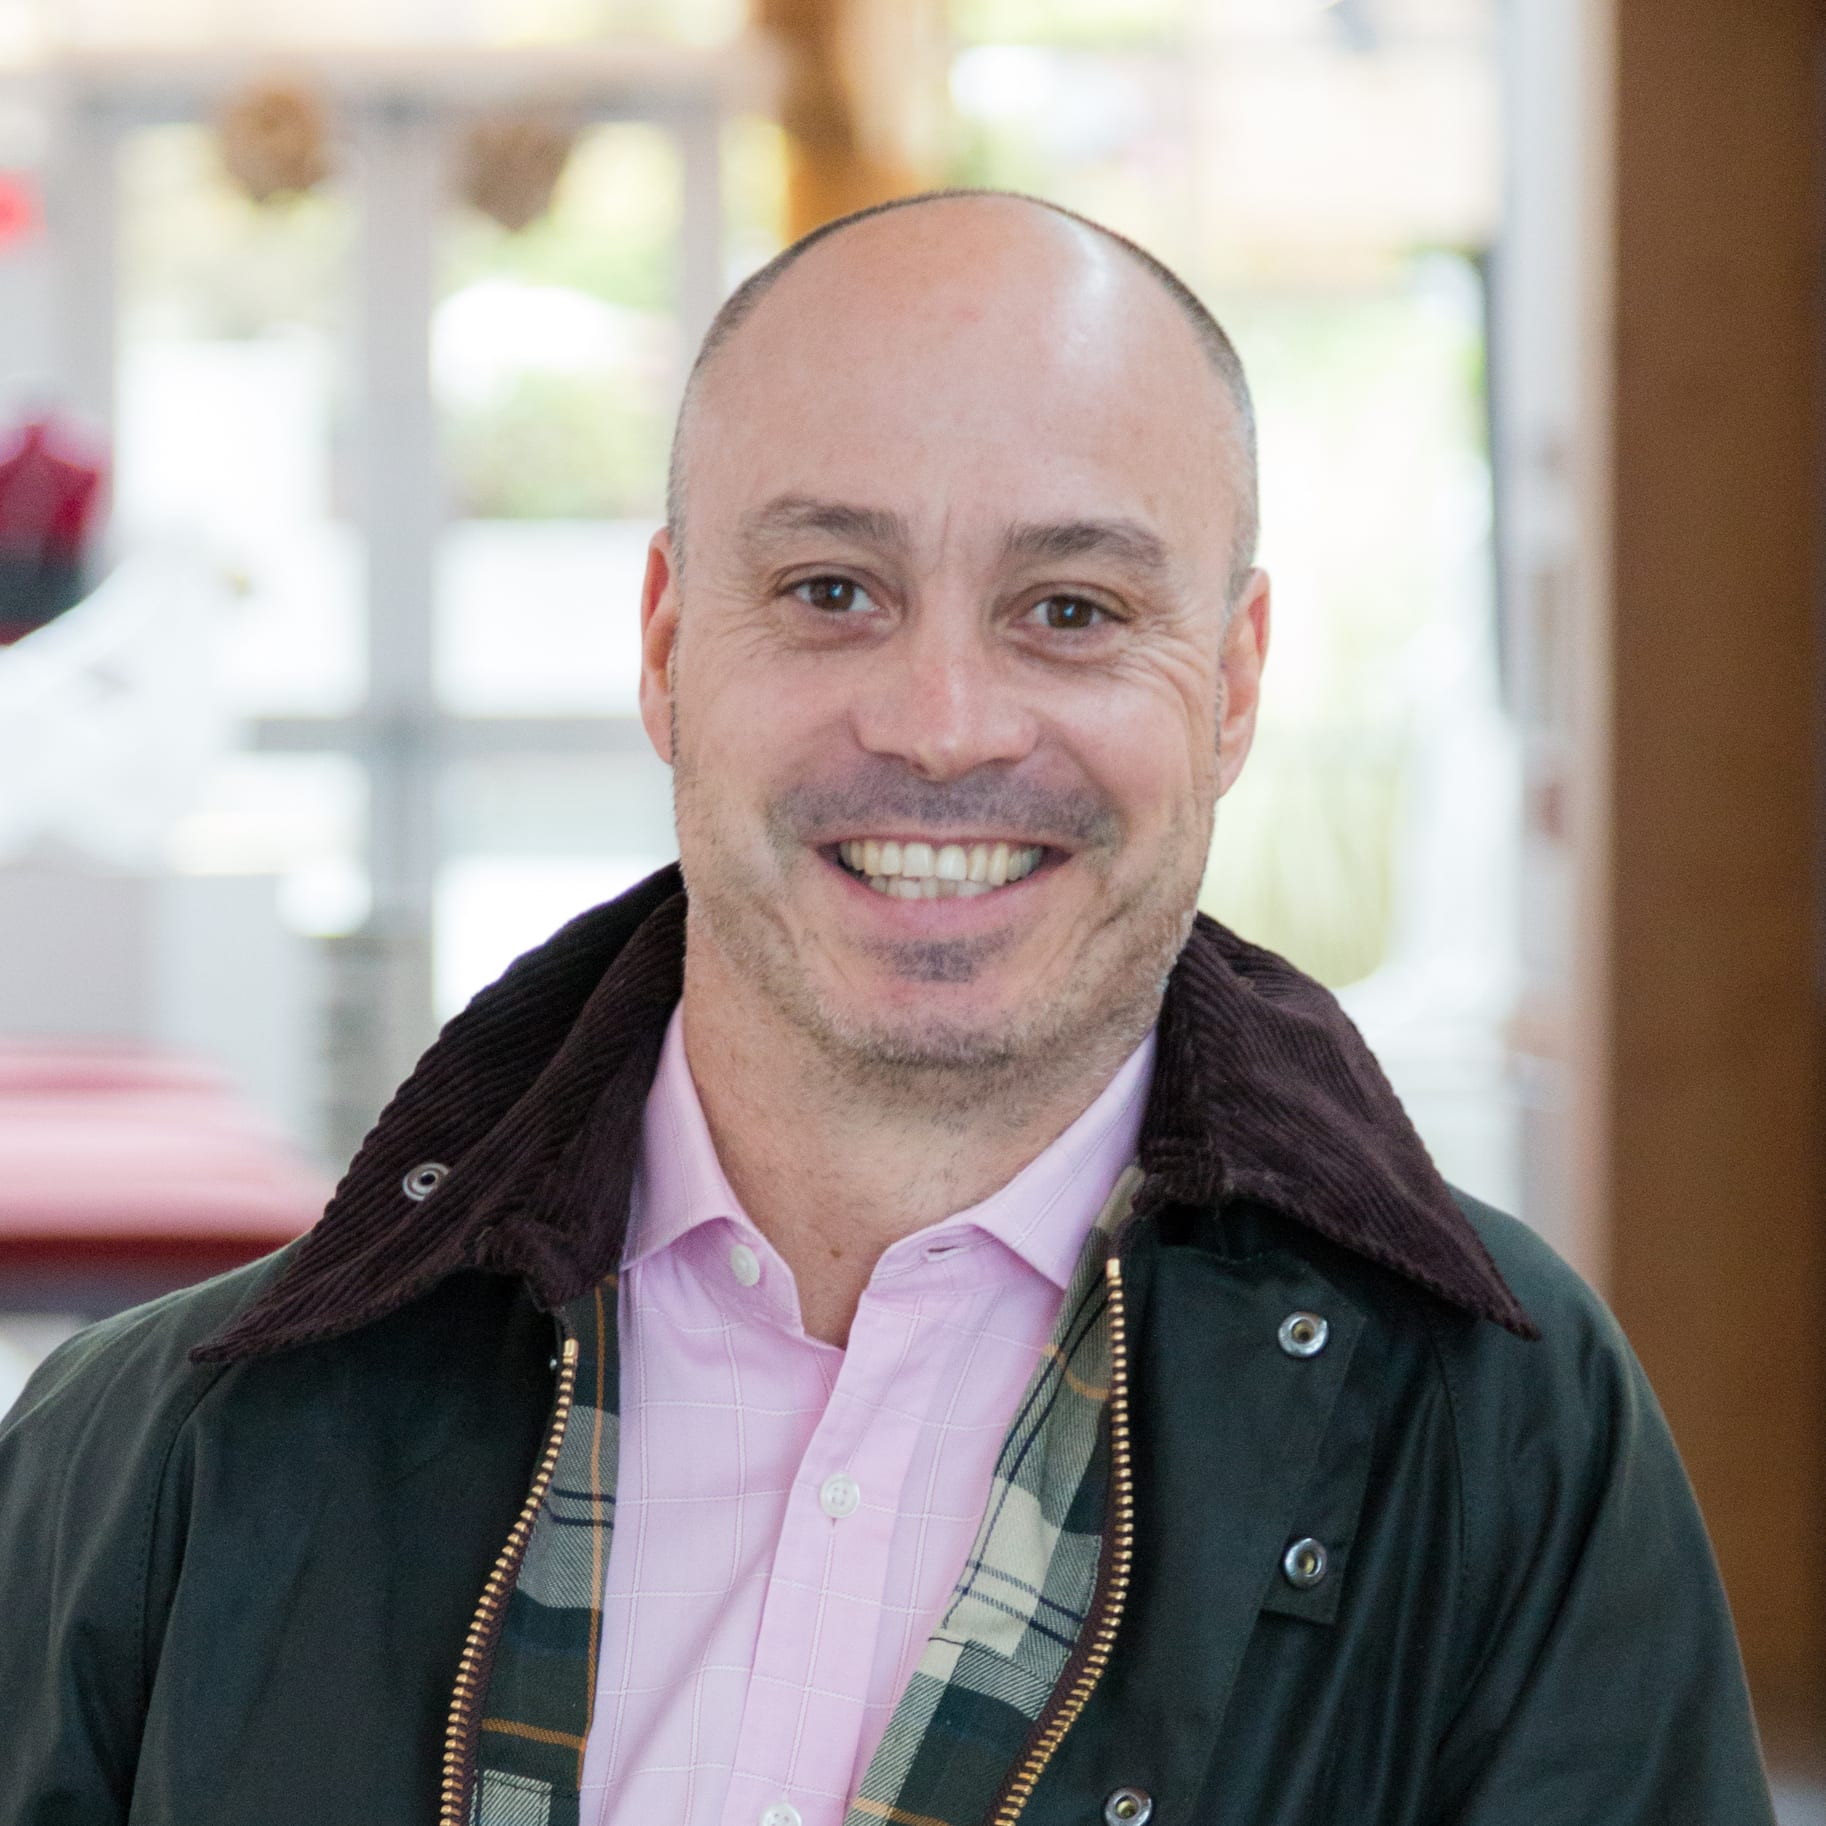 Ian McPherson – Director of Marketing and Communications, Student Advisor (1)